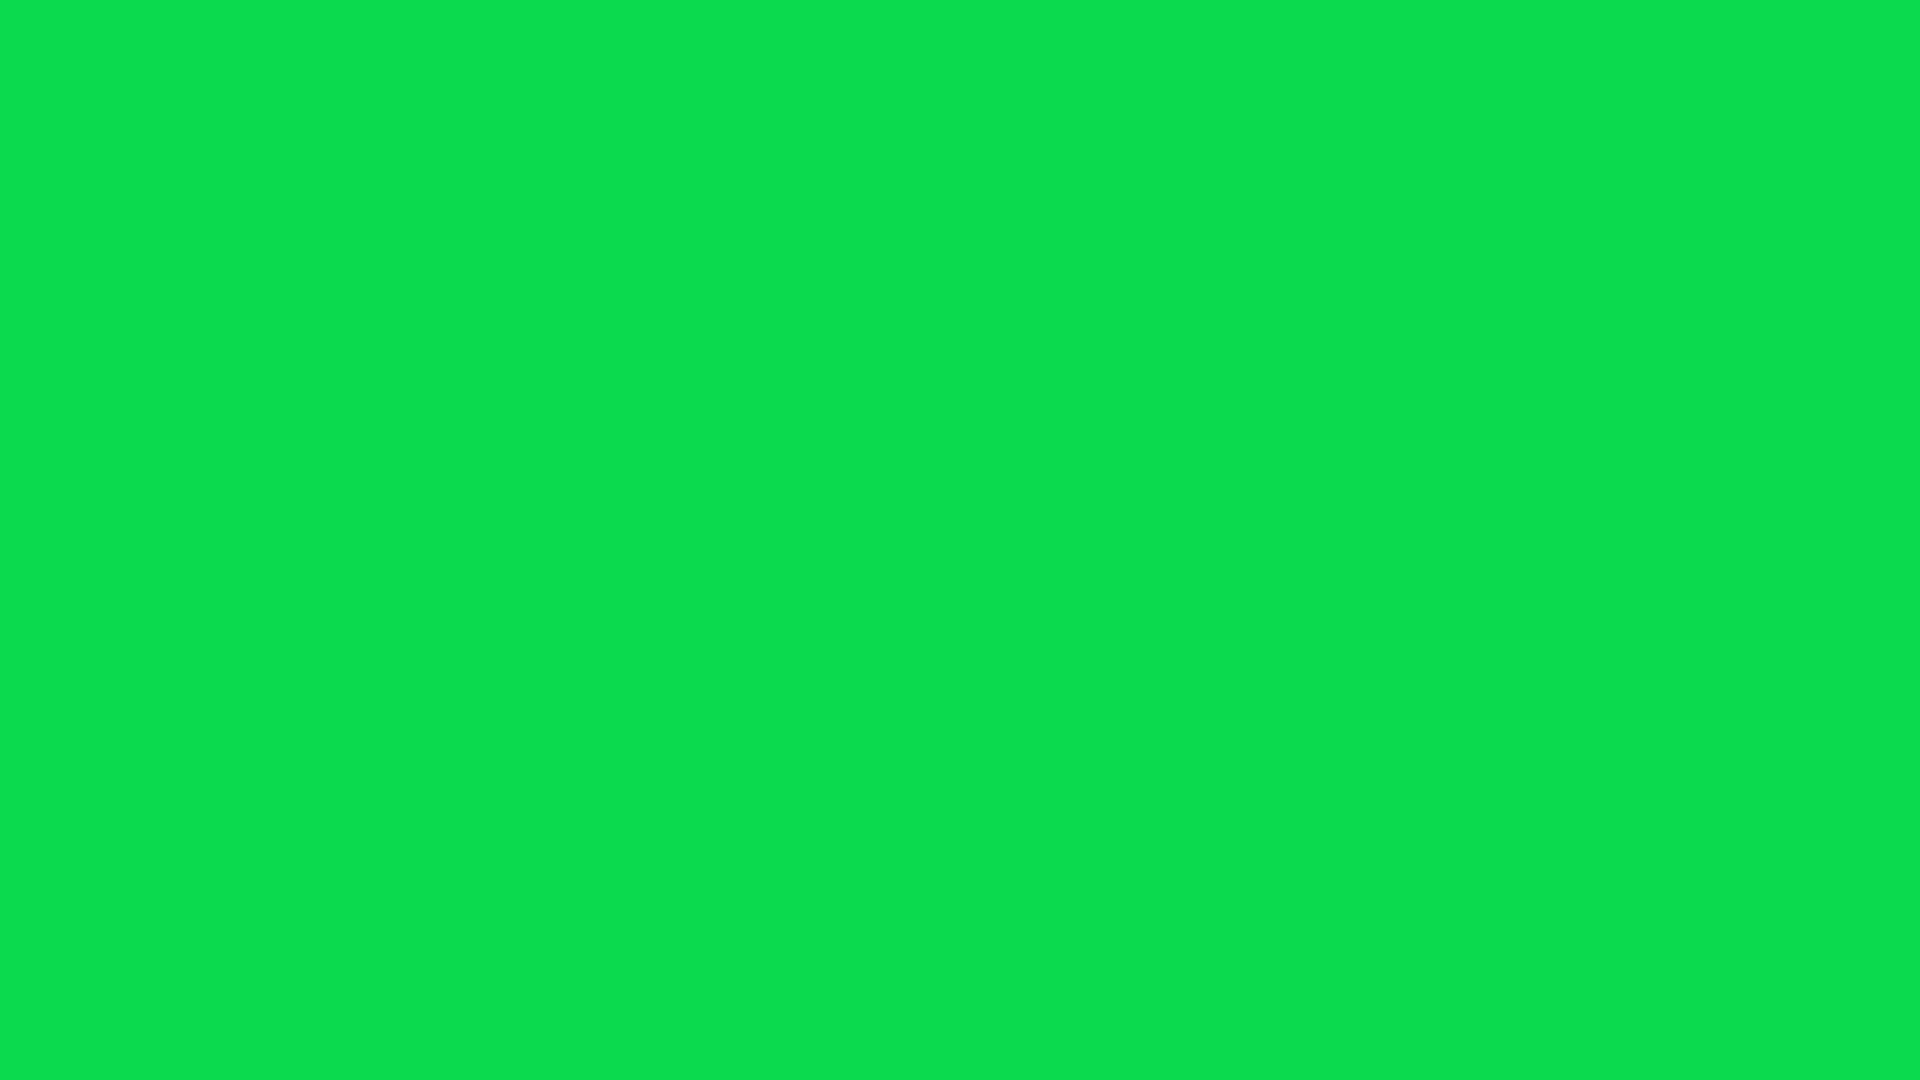 1920x1080 malachite solid color background